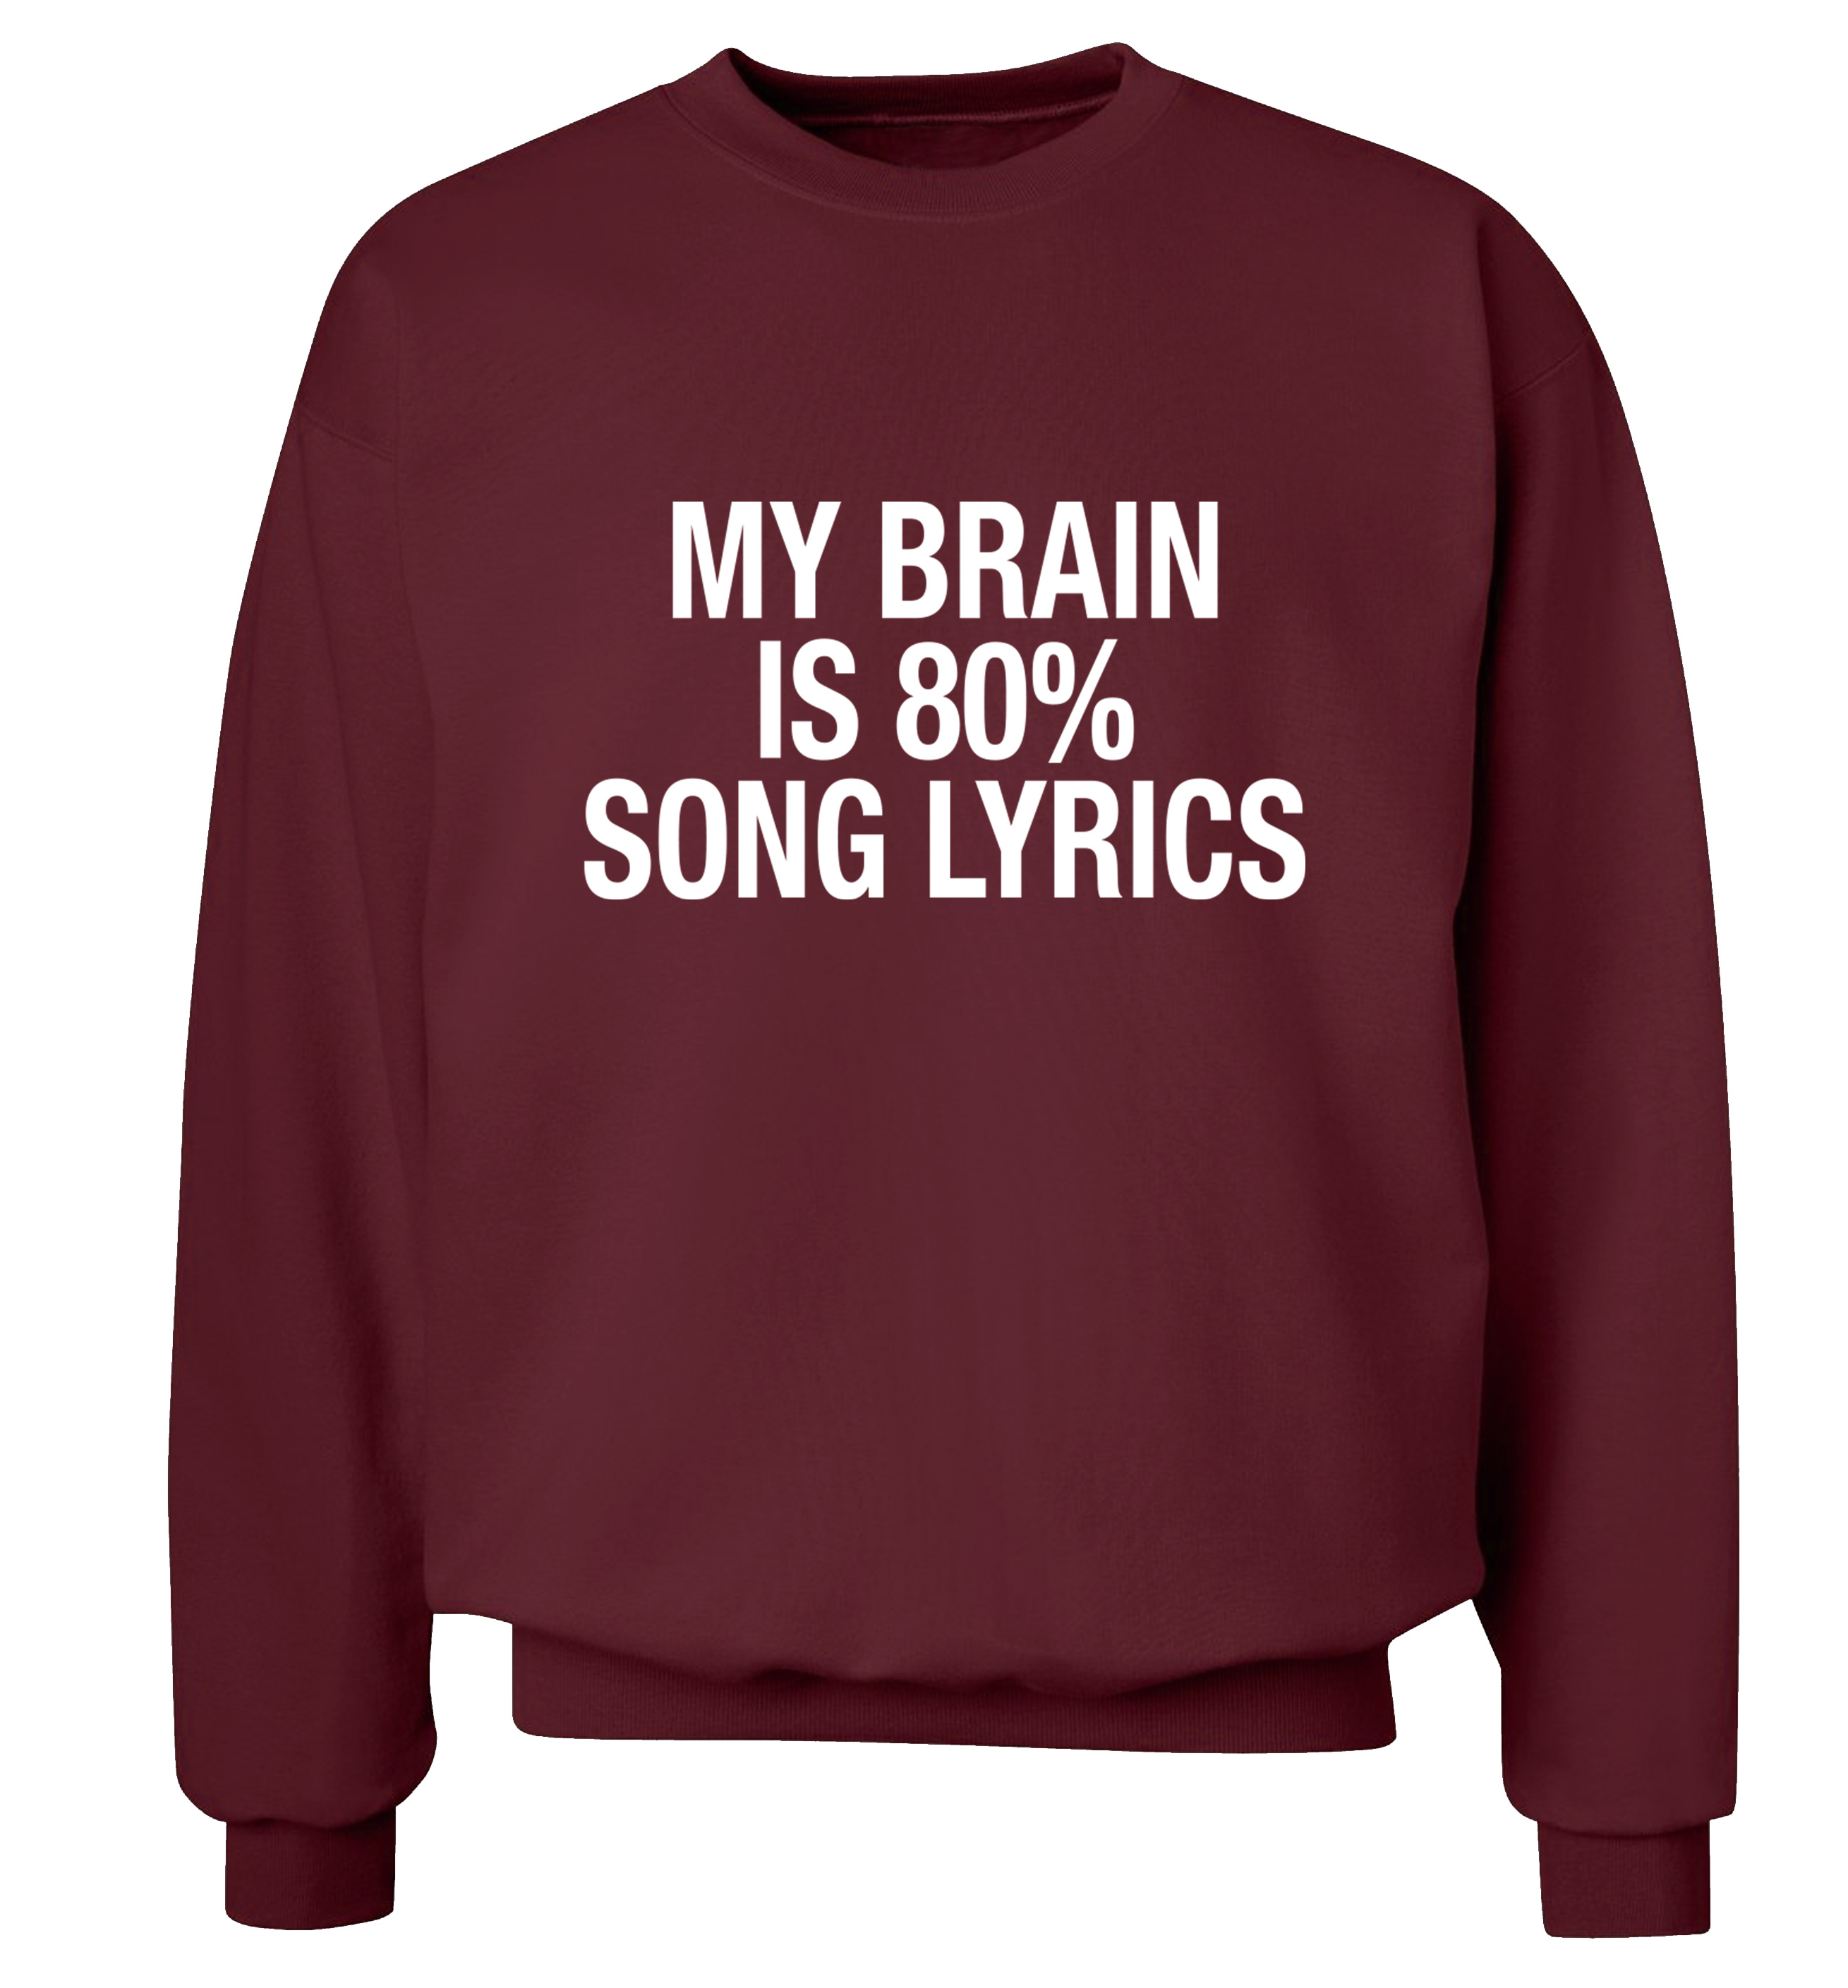 e9a47237d My brain is 80% song lyrics jumper tumblr instagram cute rock ...